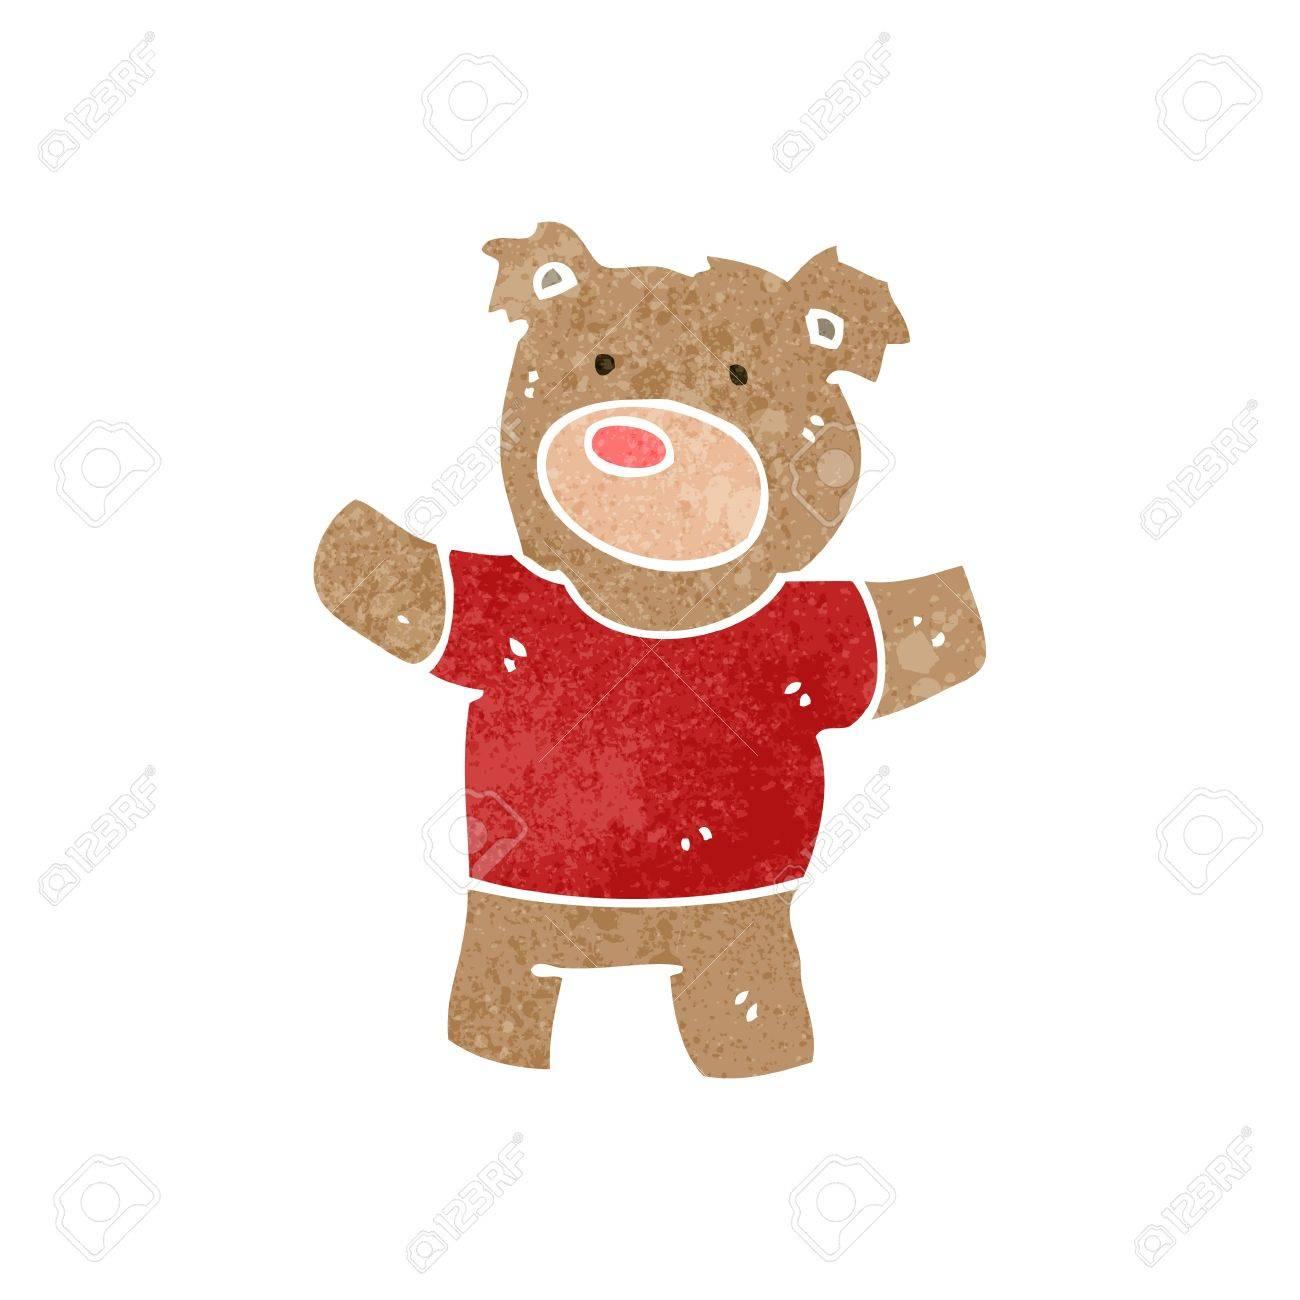 retro cartoon teddy bear - 22140343